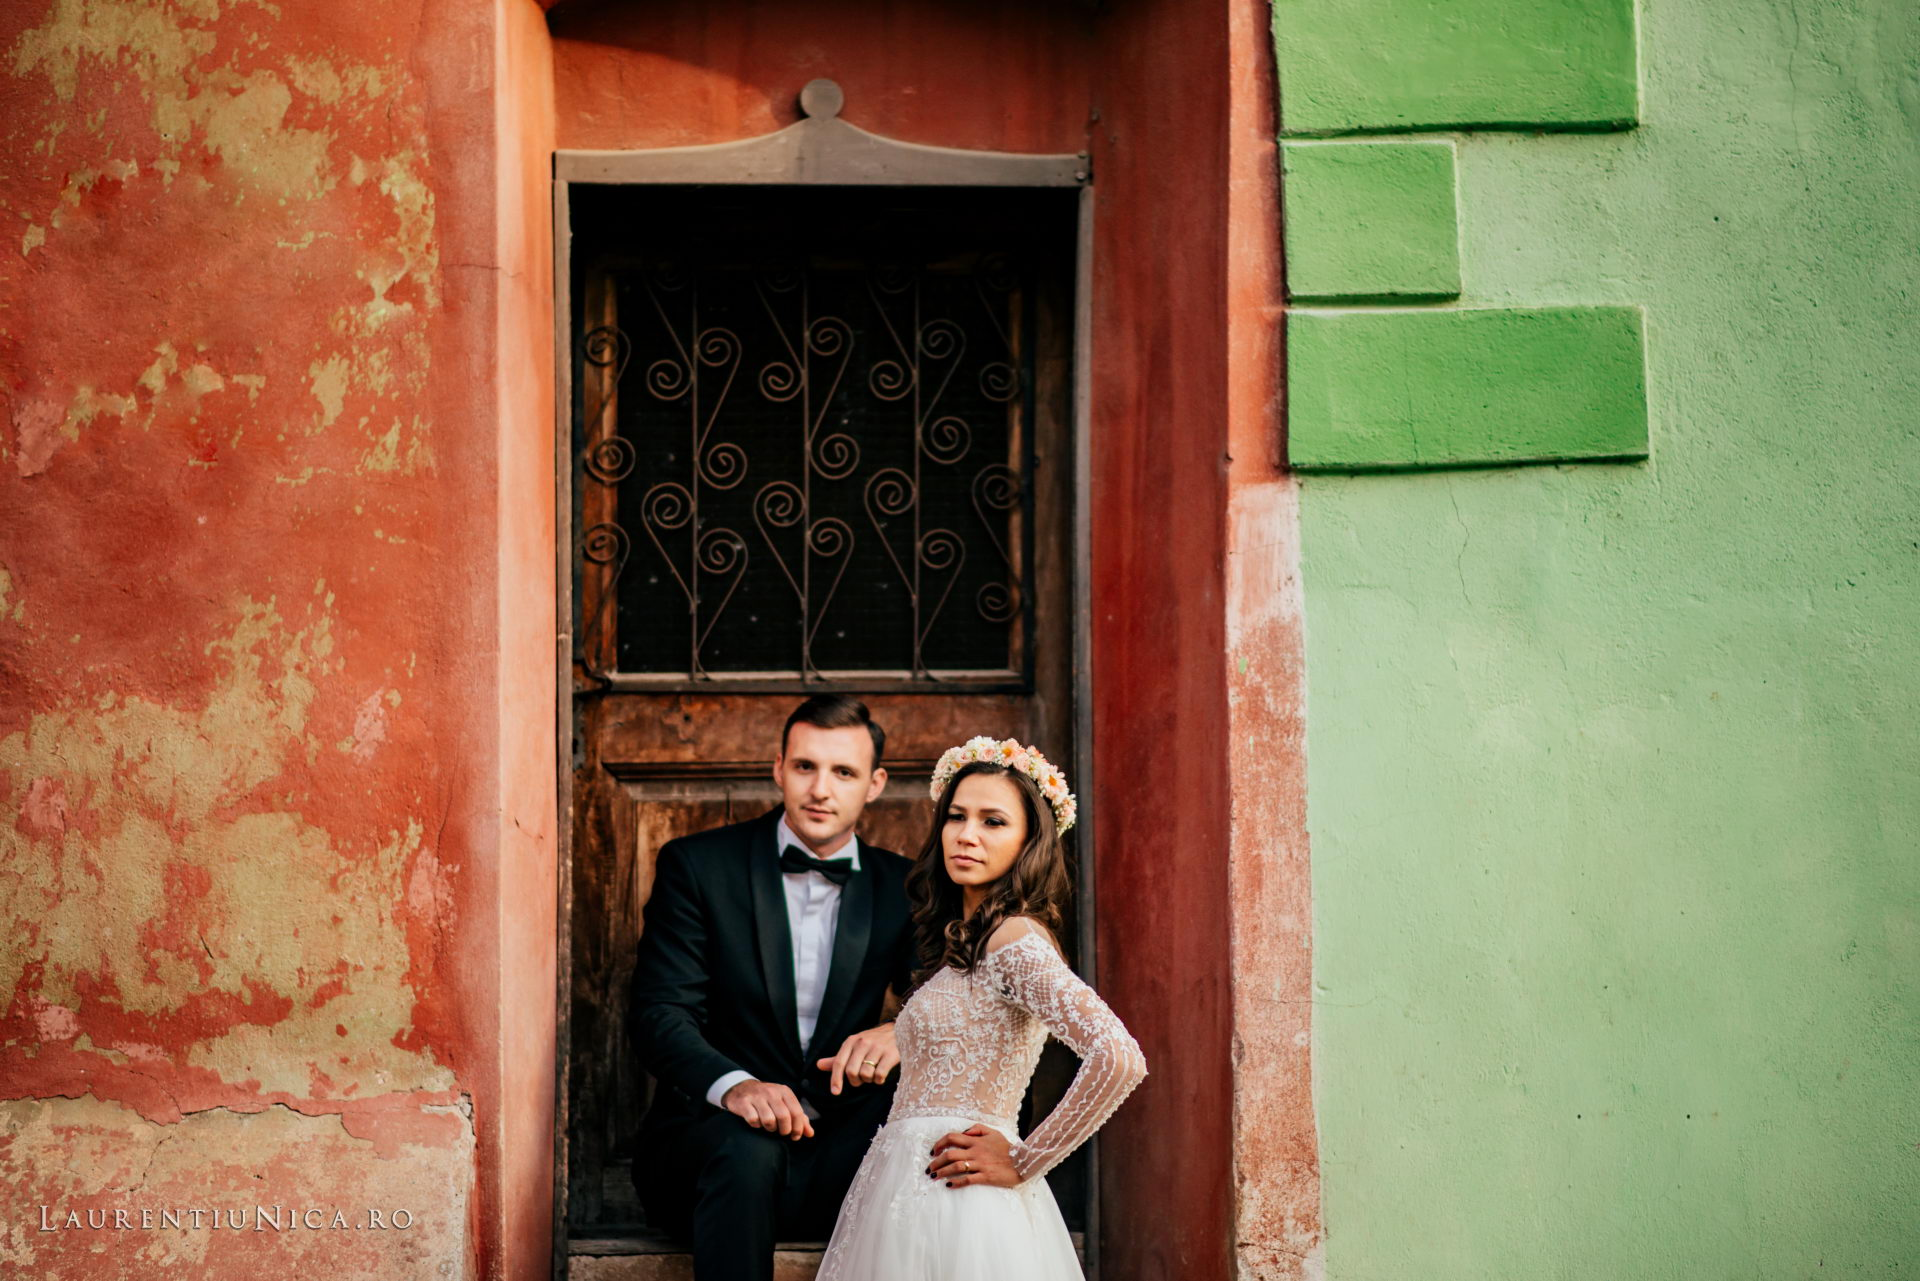 lili-si-dan-fotografii-nunta-after-wedding-sighisoara-laurentiu-nica35